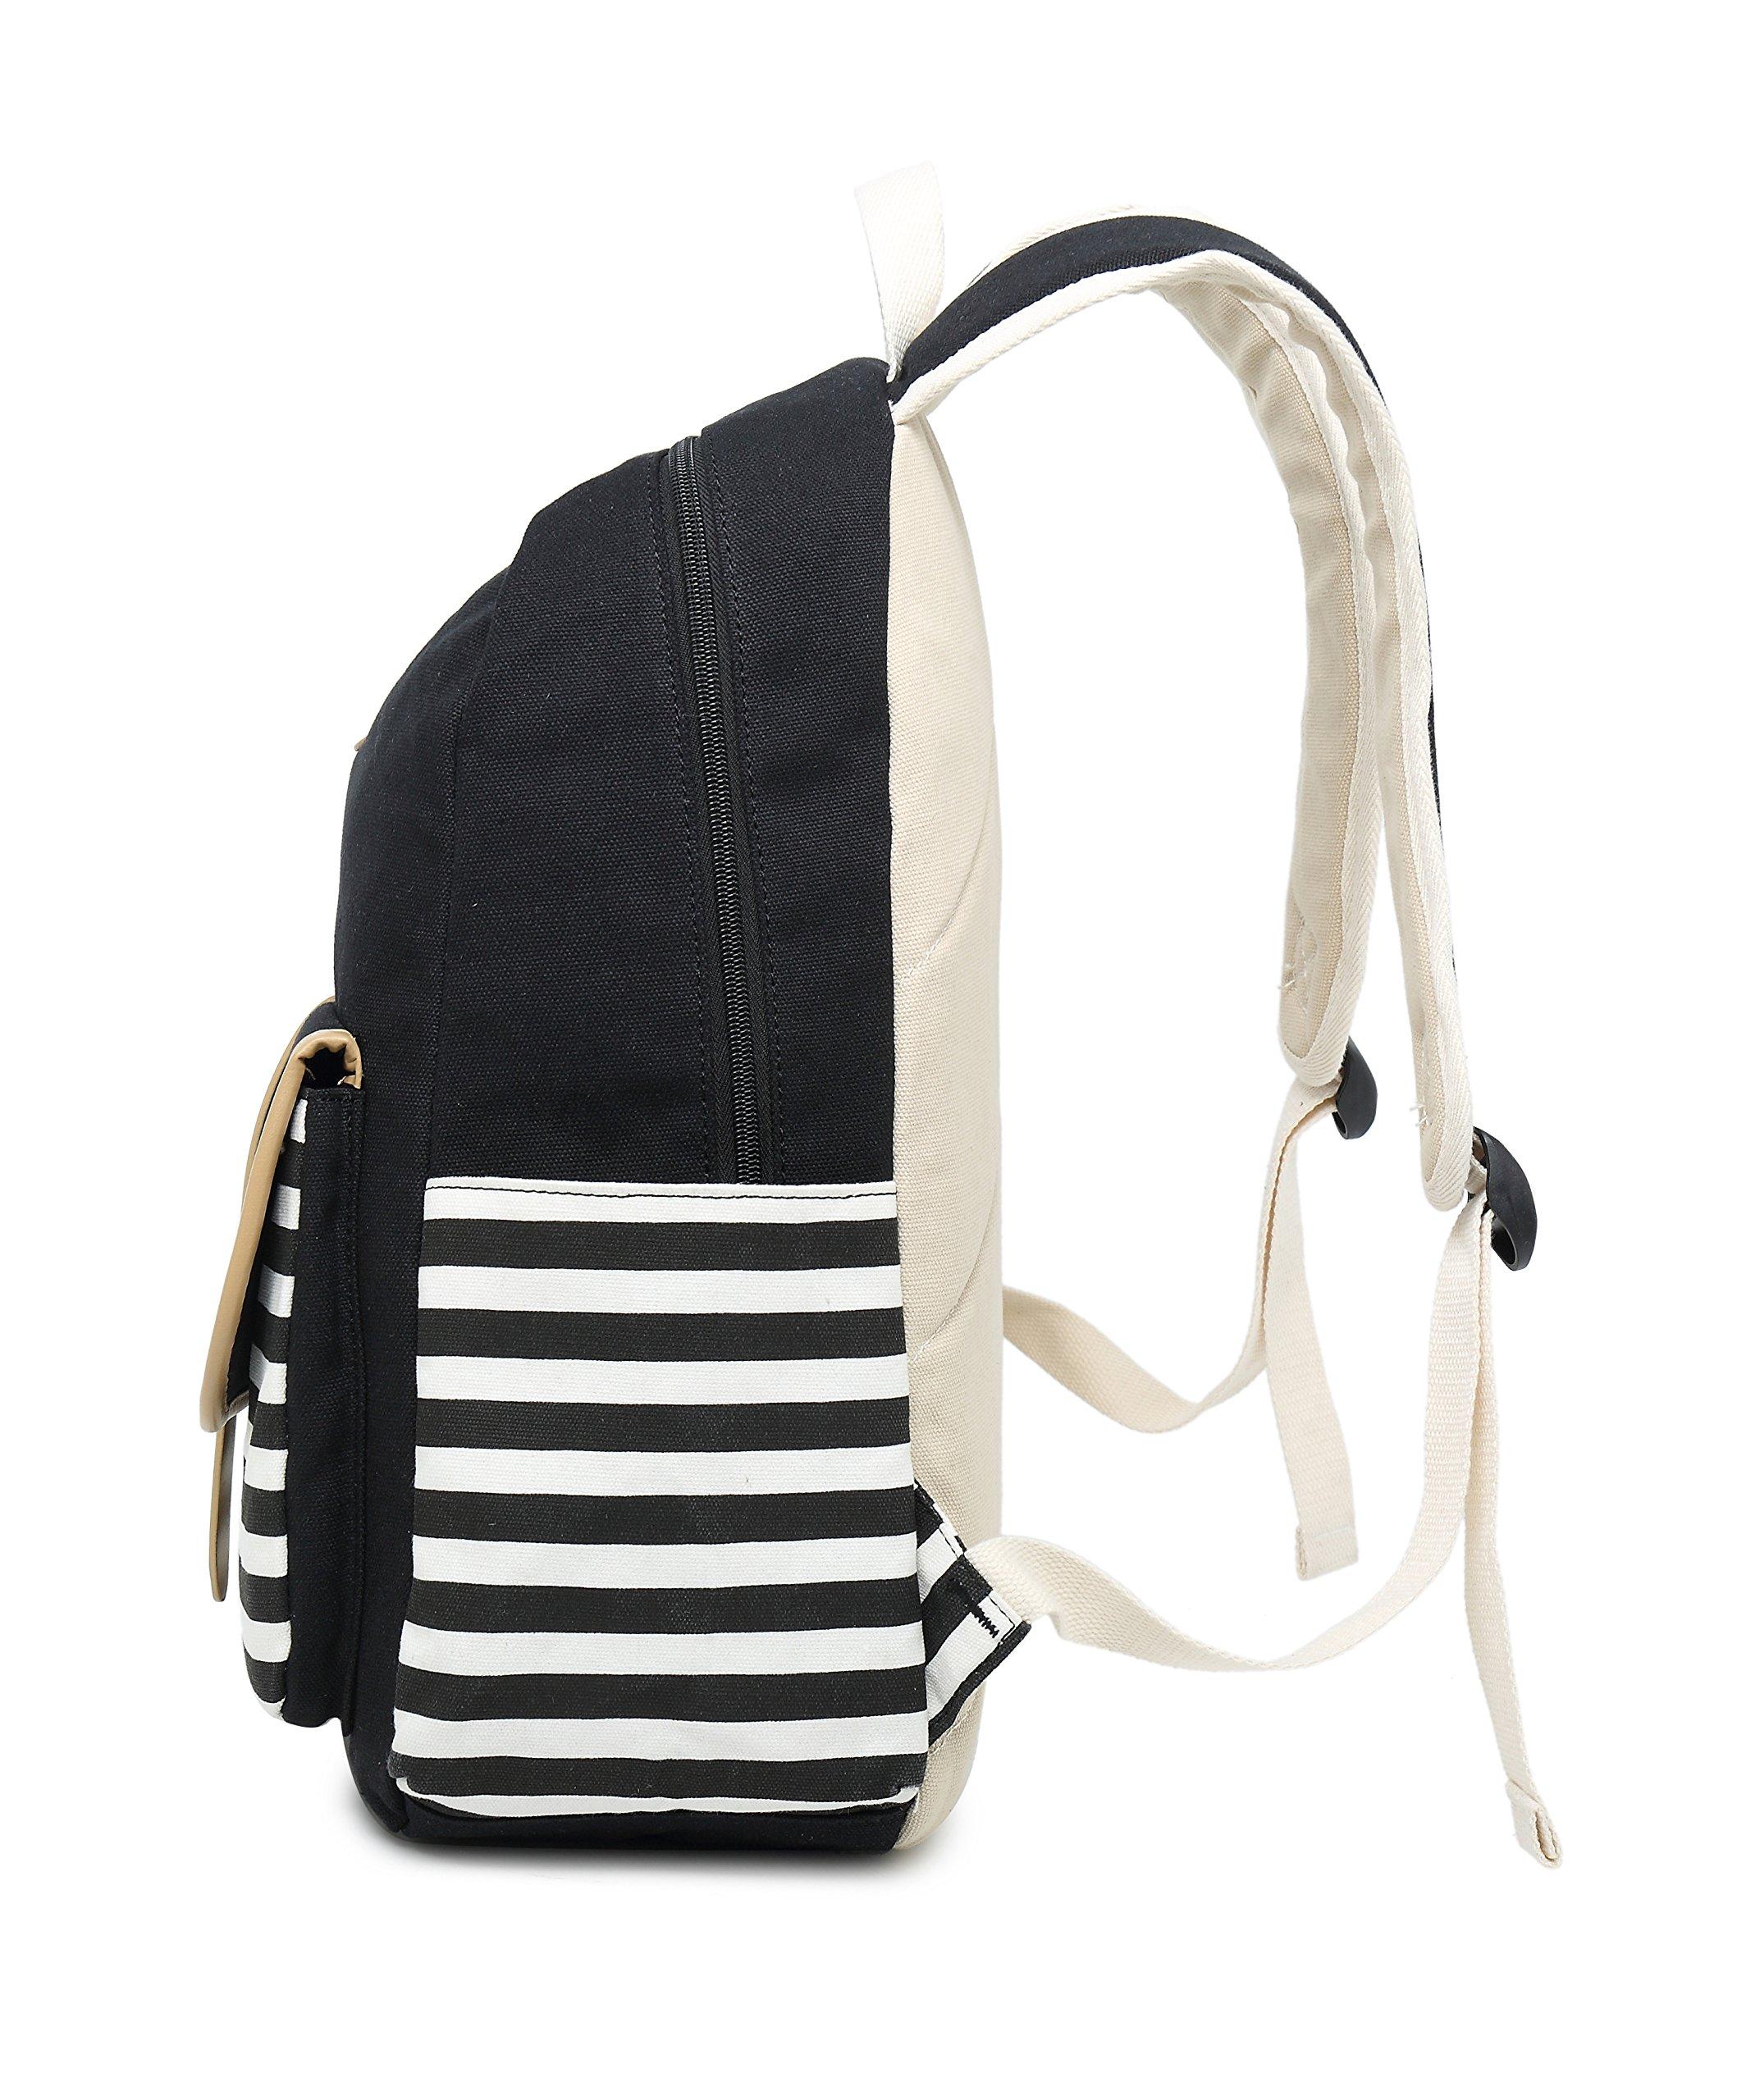 School Backpack for Girls, Gazigo Womens High School College Bookbags Laptop Bag (Black) by Gazigo (Image #4)